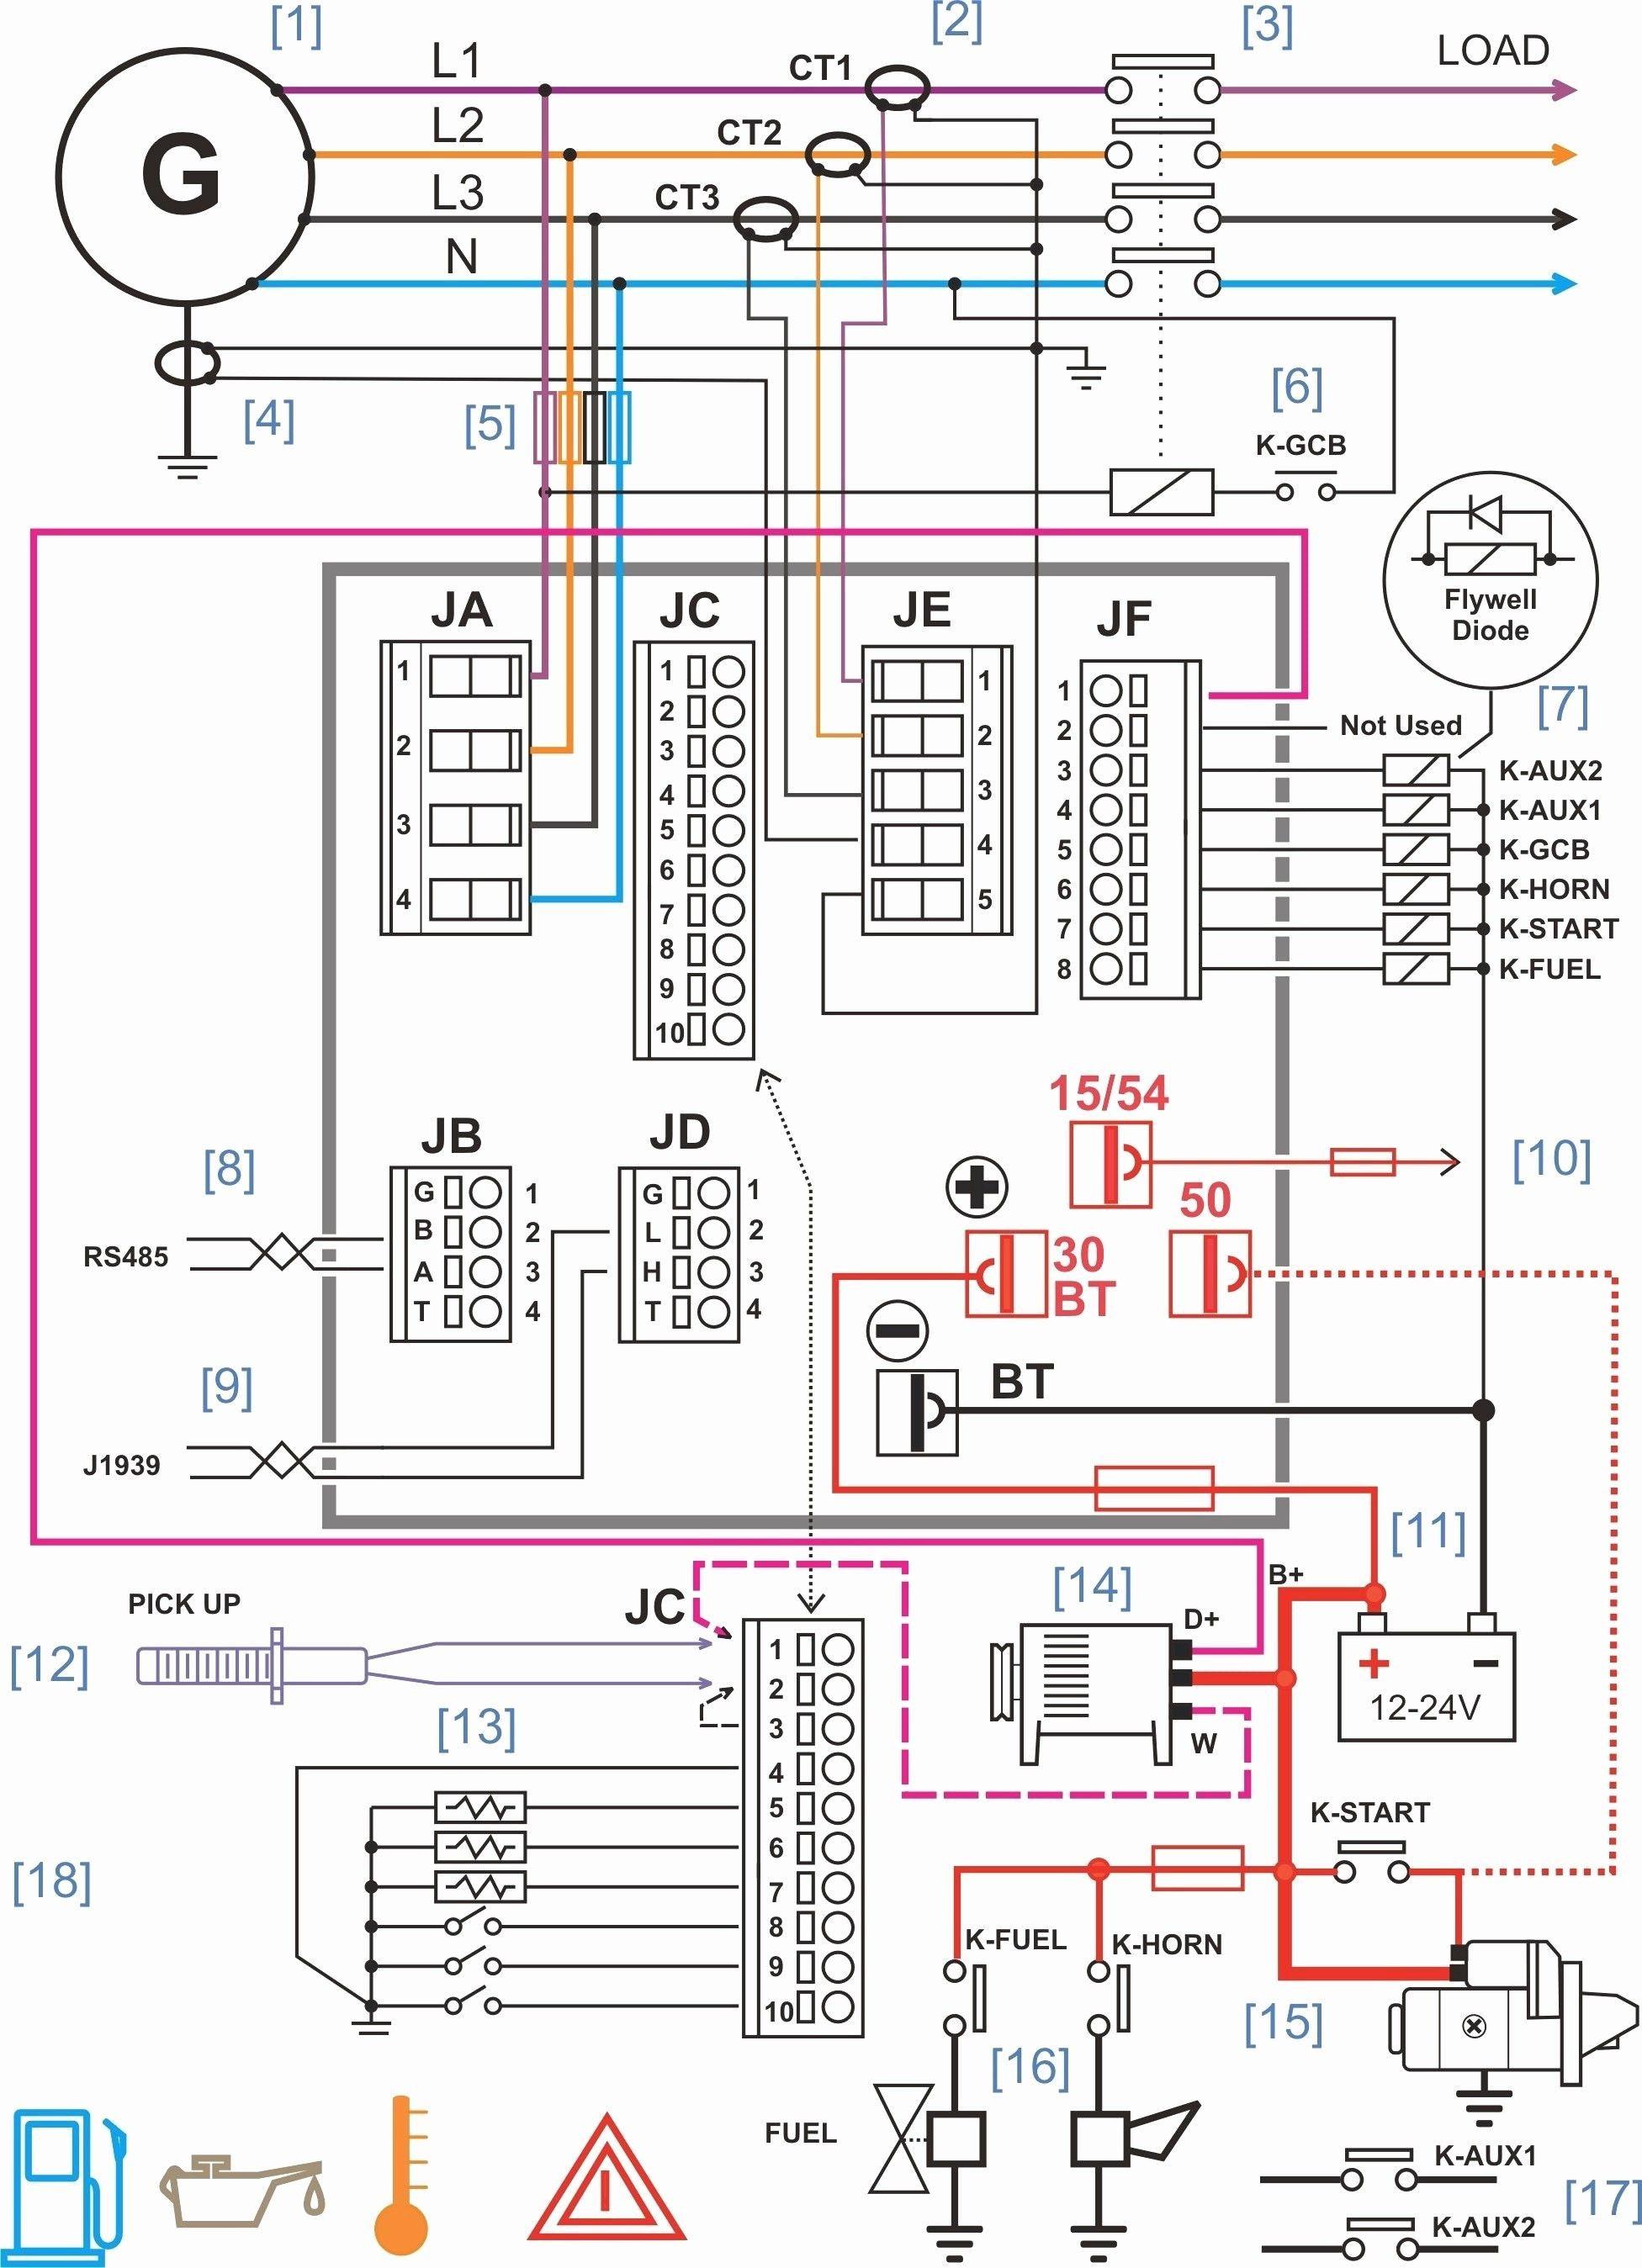 Car Voltmeter Wiring Diagram Unique Wiring Diagram Mccb Motorized Schneider Diagrams Of Car Voltmeter Wiring Diagram